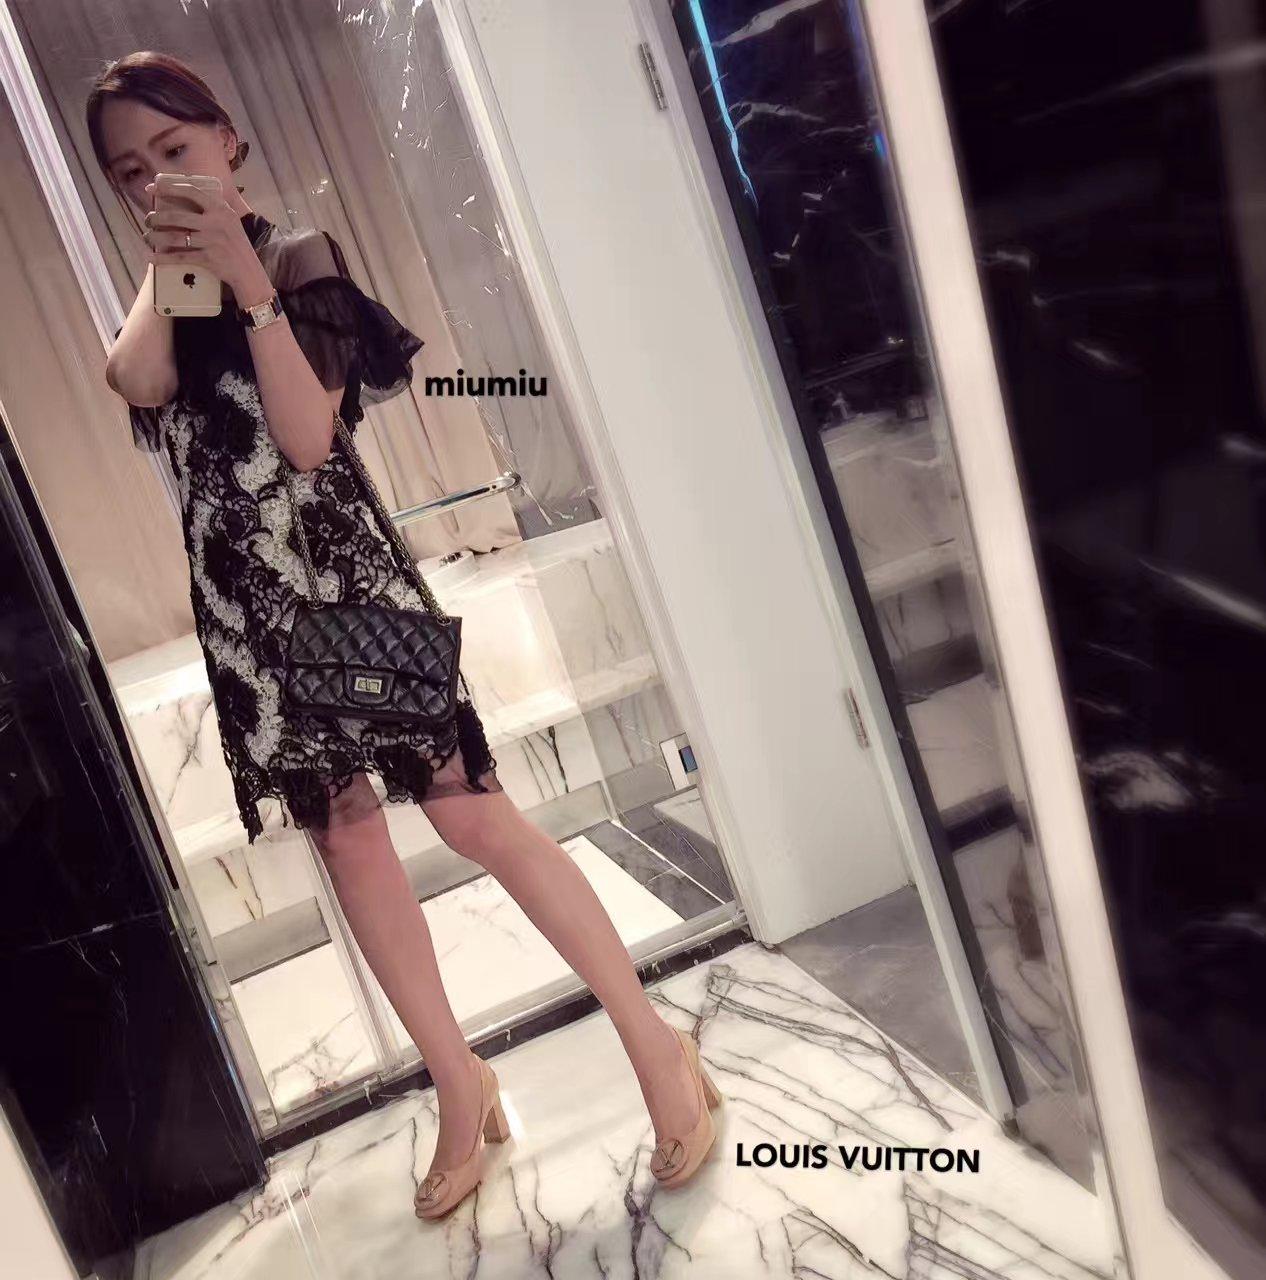 【LOUIS VUITTON女鞋】专柜在售经典圆扣高跟单鞋